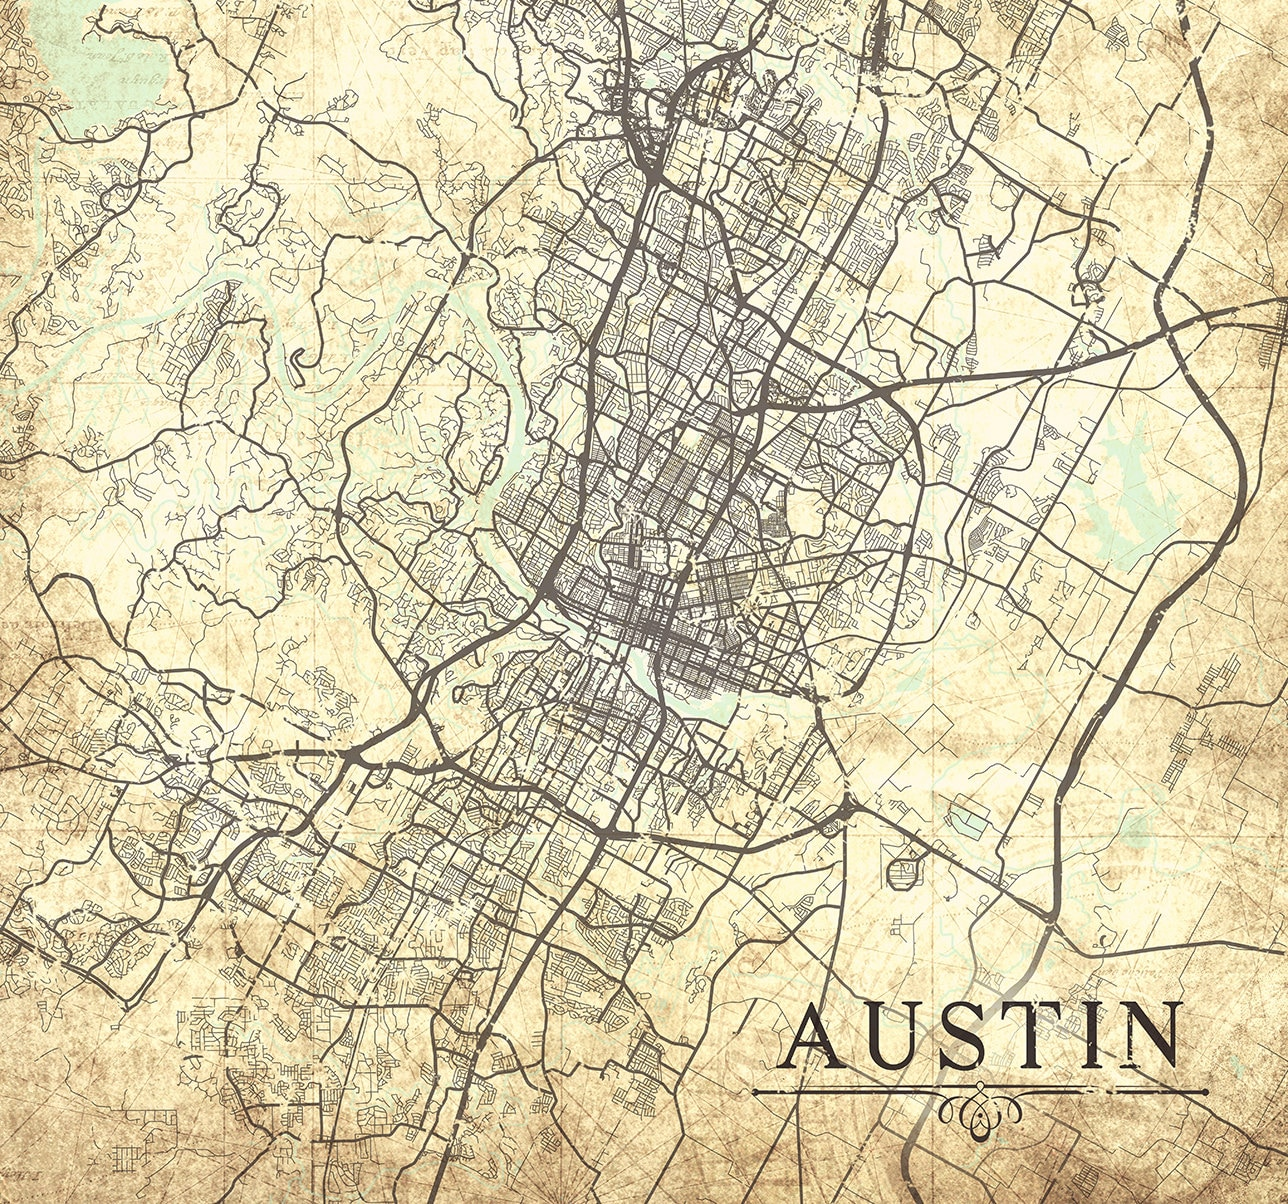 AUSTIN TX Canvas Print Texas TX Vintage map Austin tx City ... on old calgary maps, old orlando maps, old el paso county maps, old michigan maps, old oakland maps, old tallahassee maps, old florida maps, old minnesota maps, old bowling green maps, old tinley park maps, old pensacola maps, old green bay maps, old stockton maps, old raleigh maps, old tobin maps, old ohio maps, old texas maps, old honolulu maps, old annapolis maps, old chico maps,